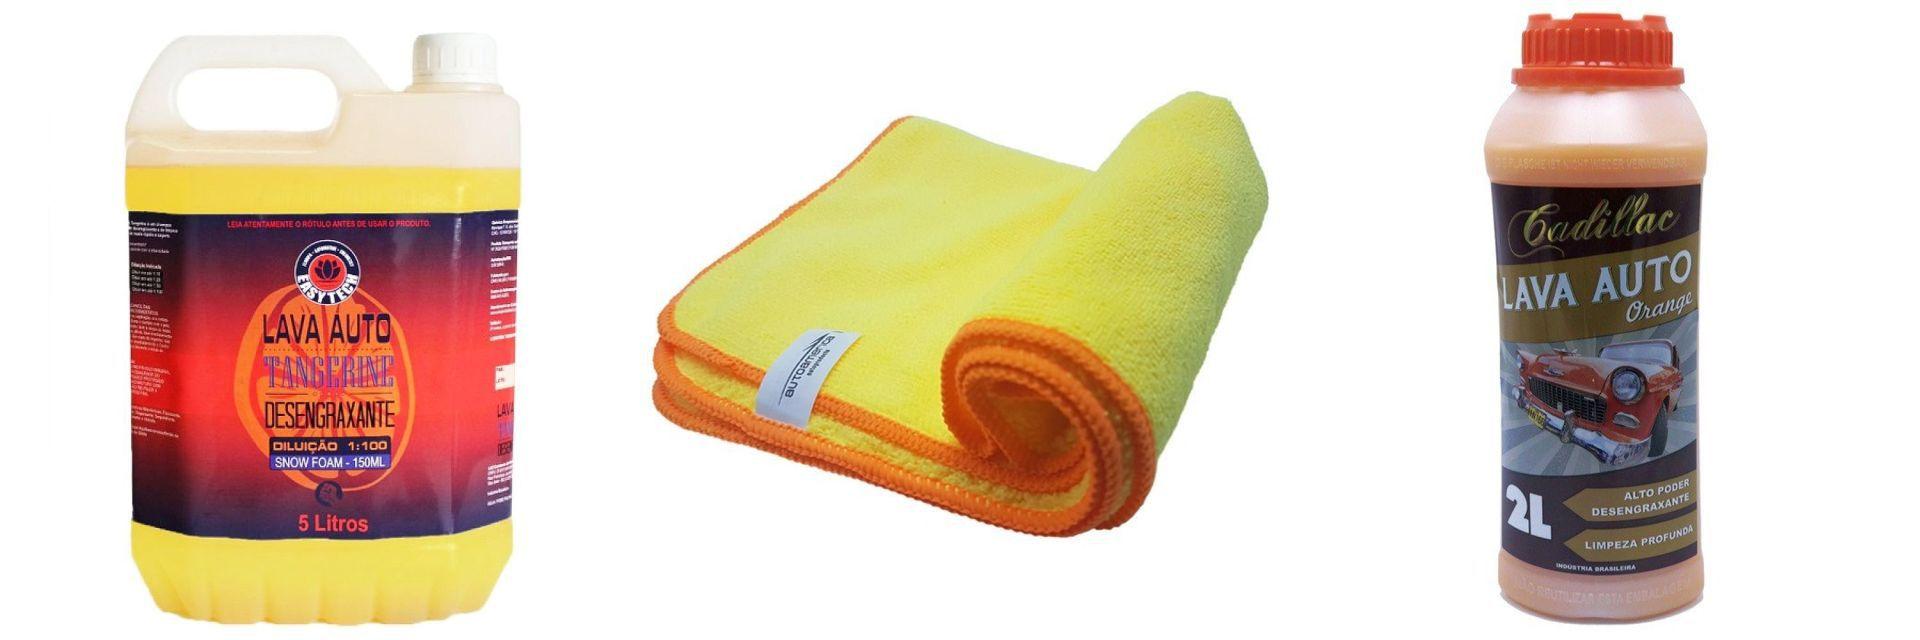 Kit Flanela+ Shampoo Tangerine+ Lava Auto Orange